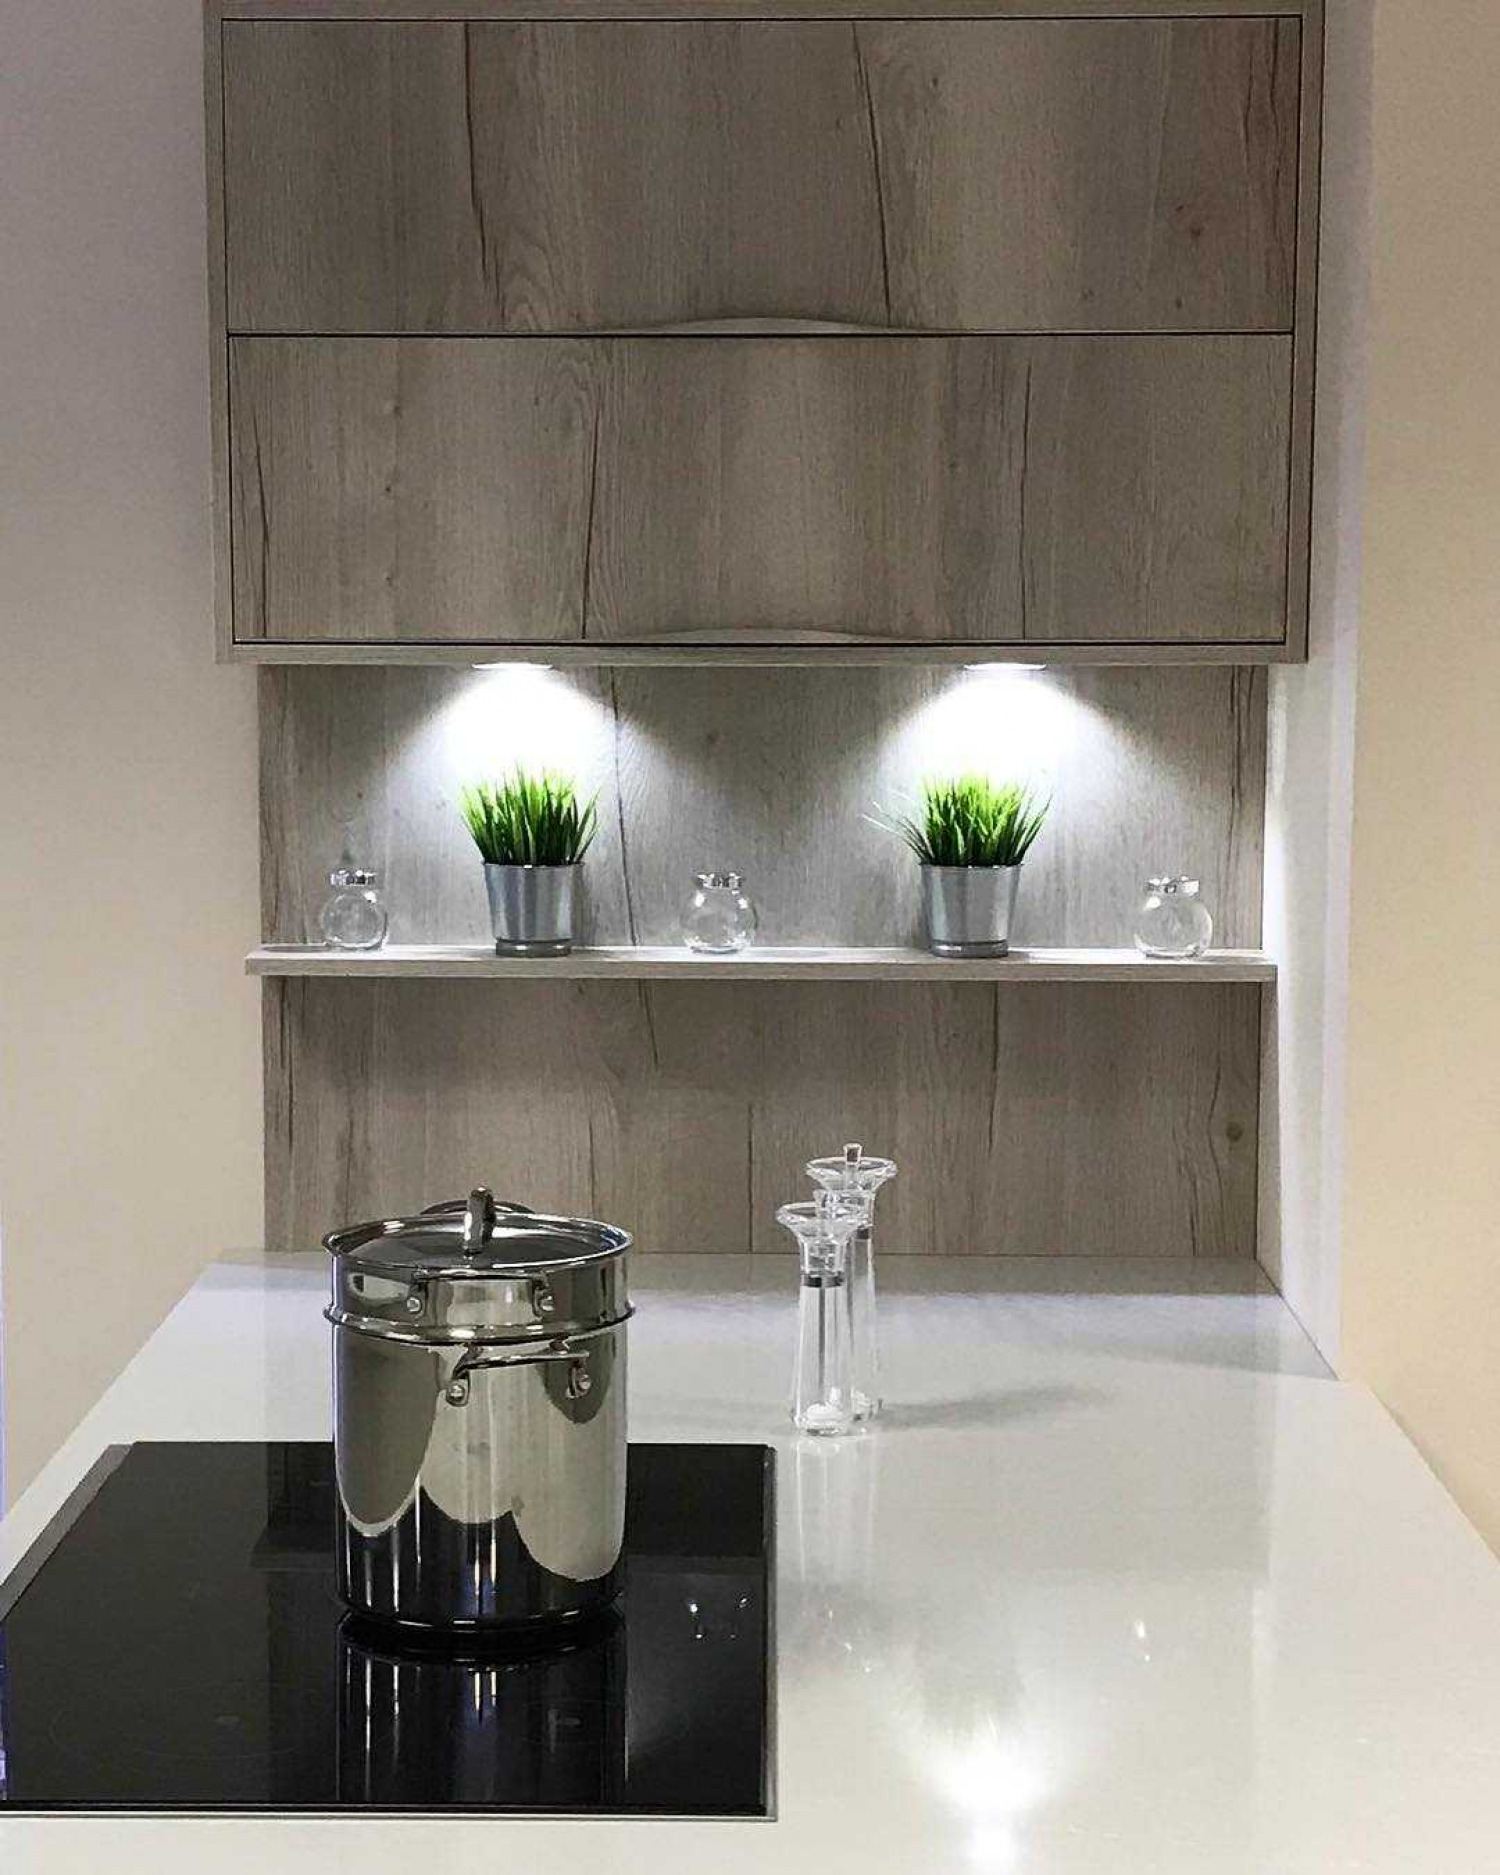 Kitchen Shelving Feature Shelves